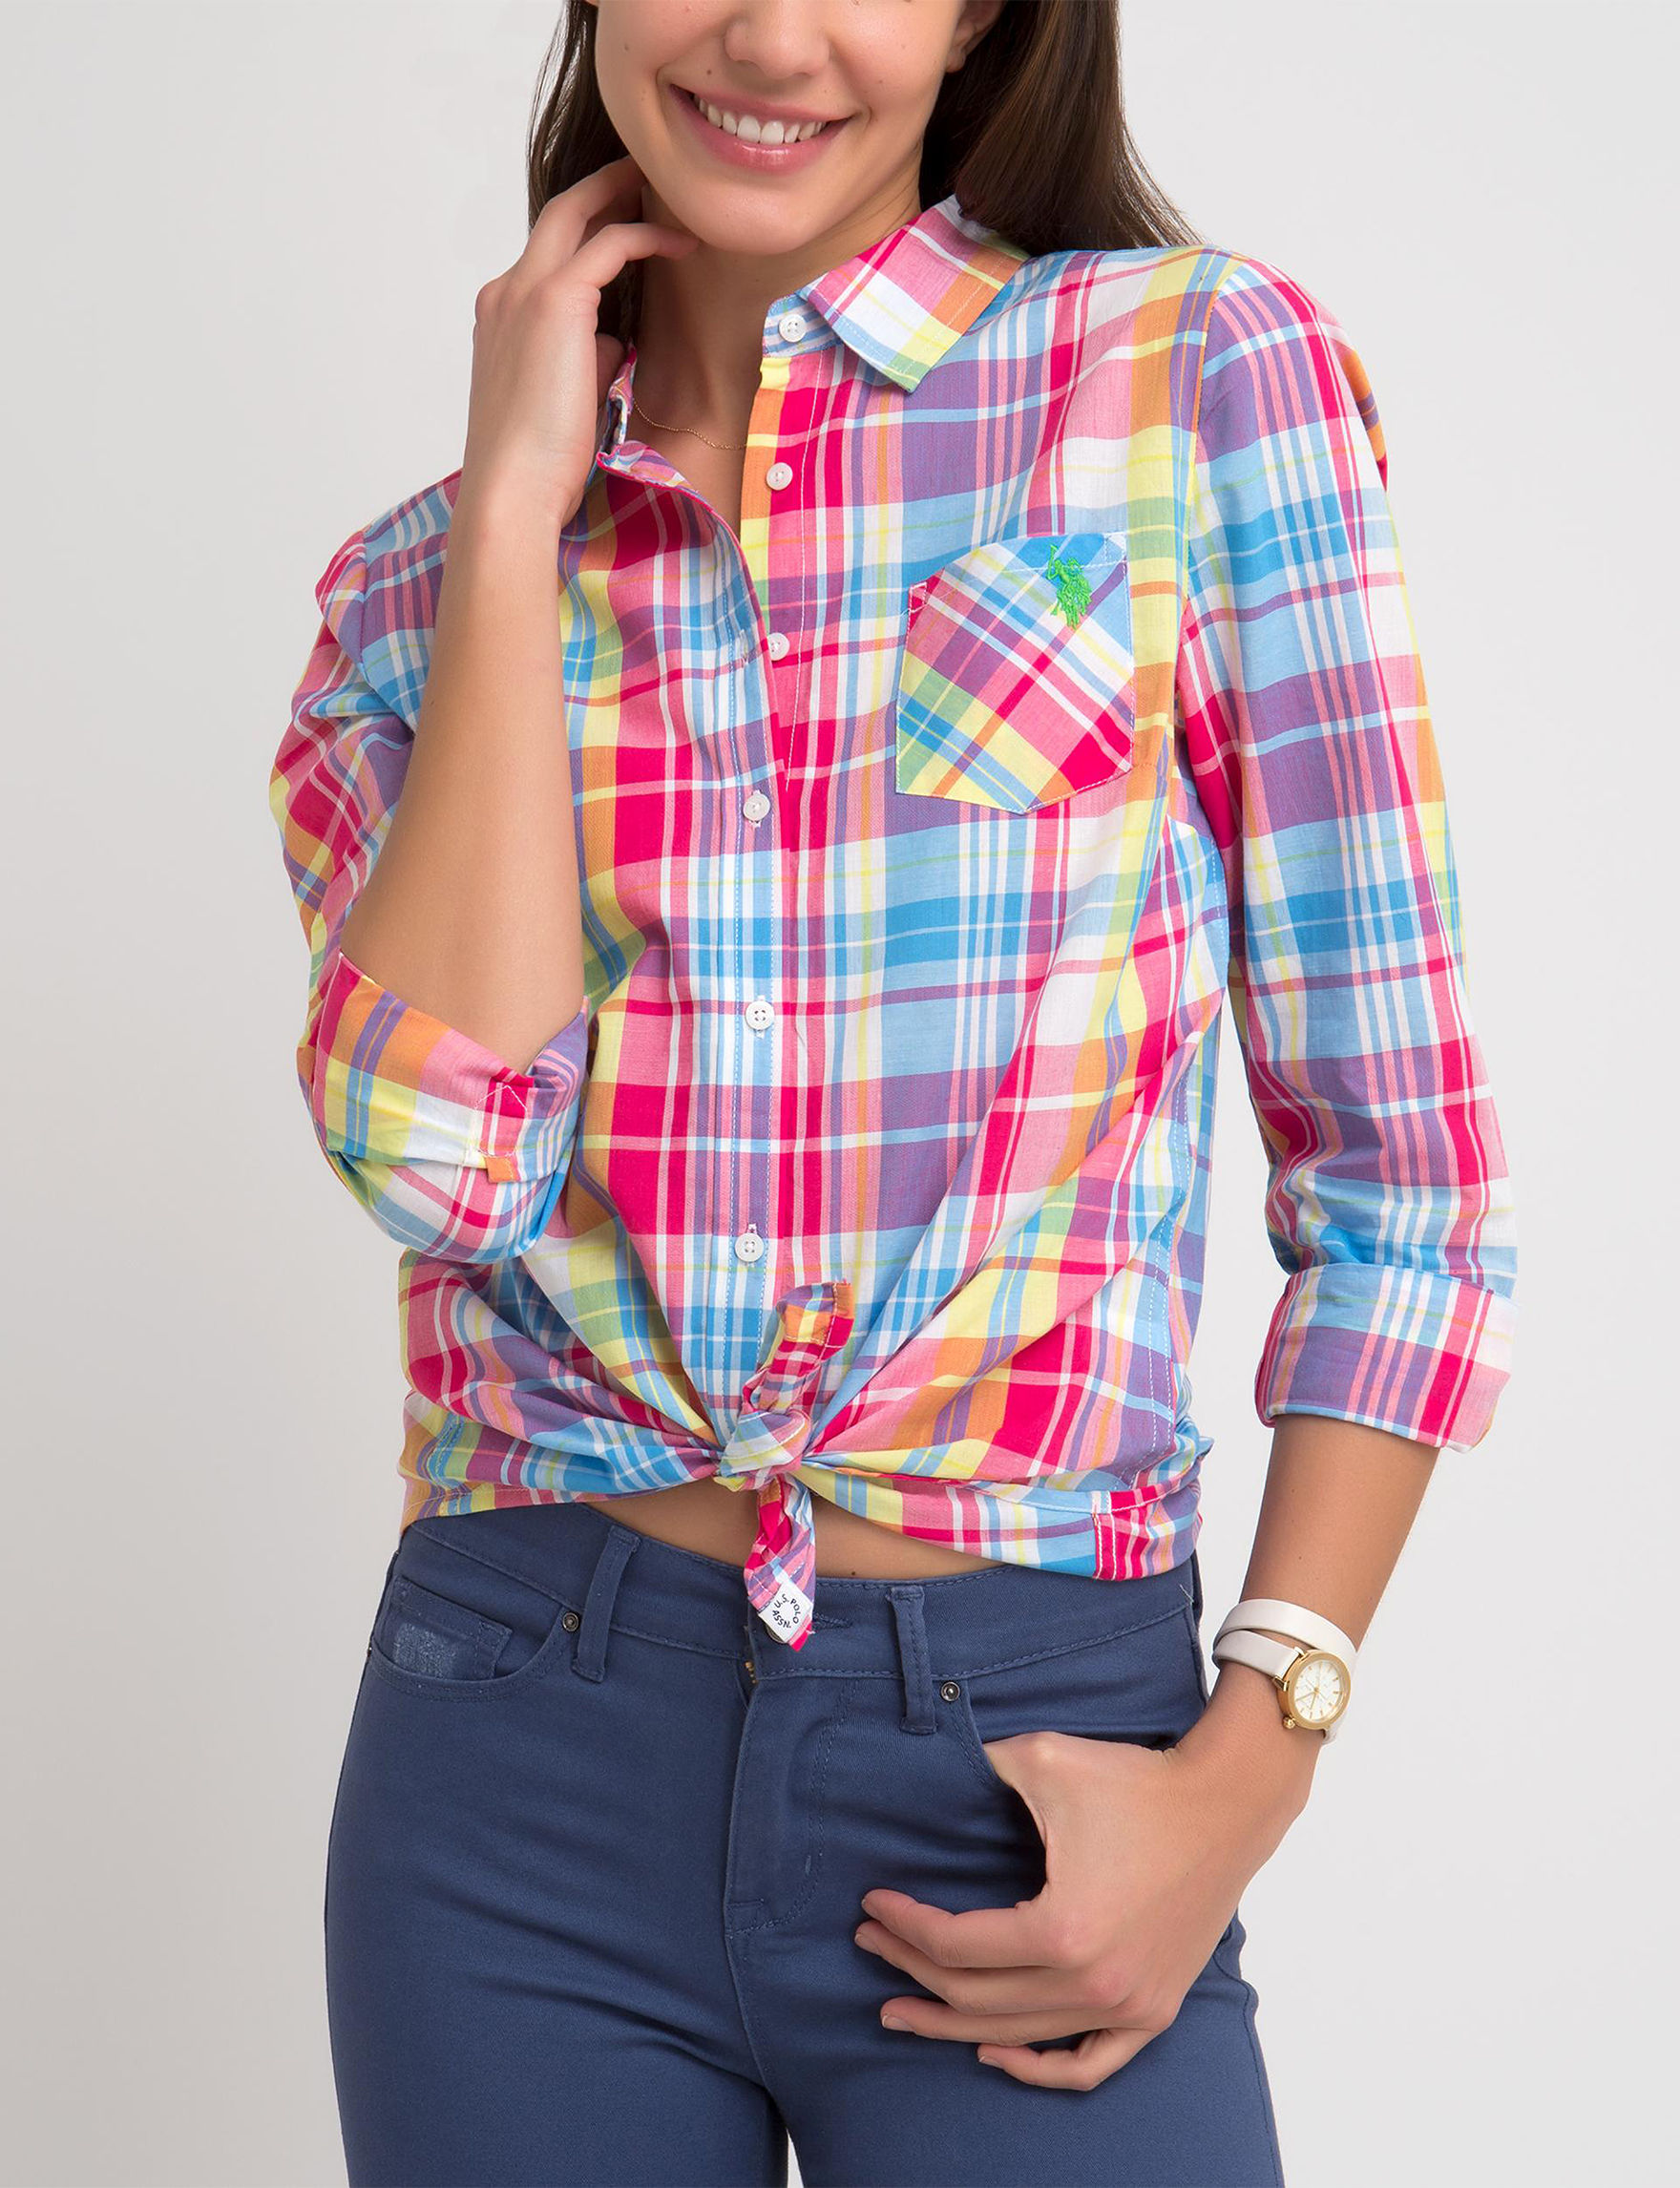 U.S. Polo Assn. Pink Multi Shirts & Blouses